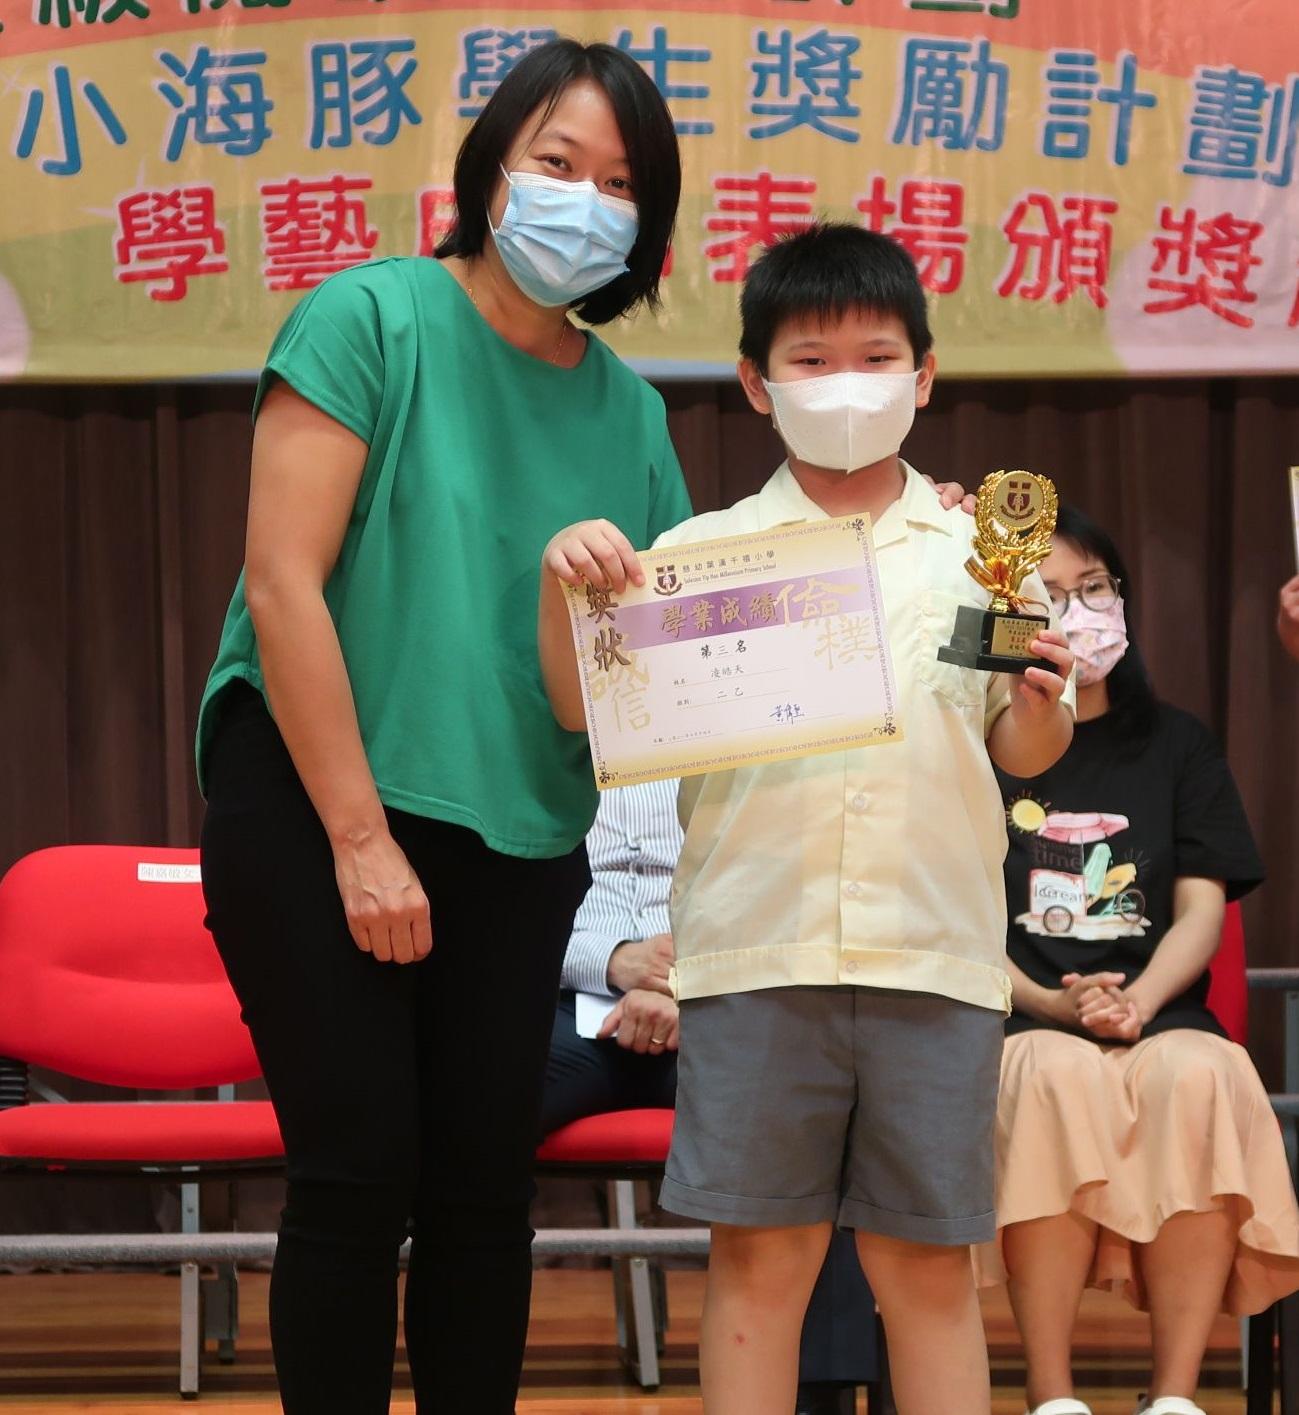 https://syh.edu.hk/sites/default/files/img_5406.jpg